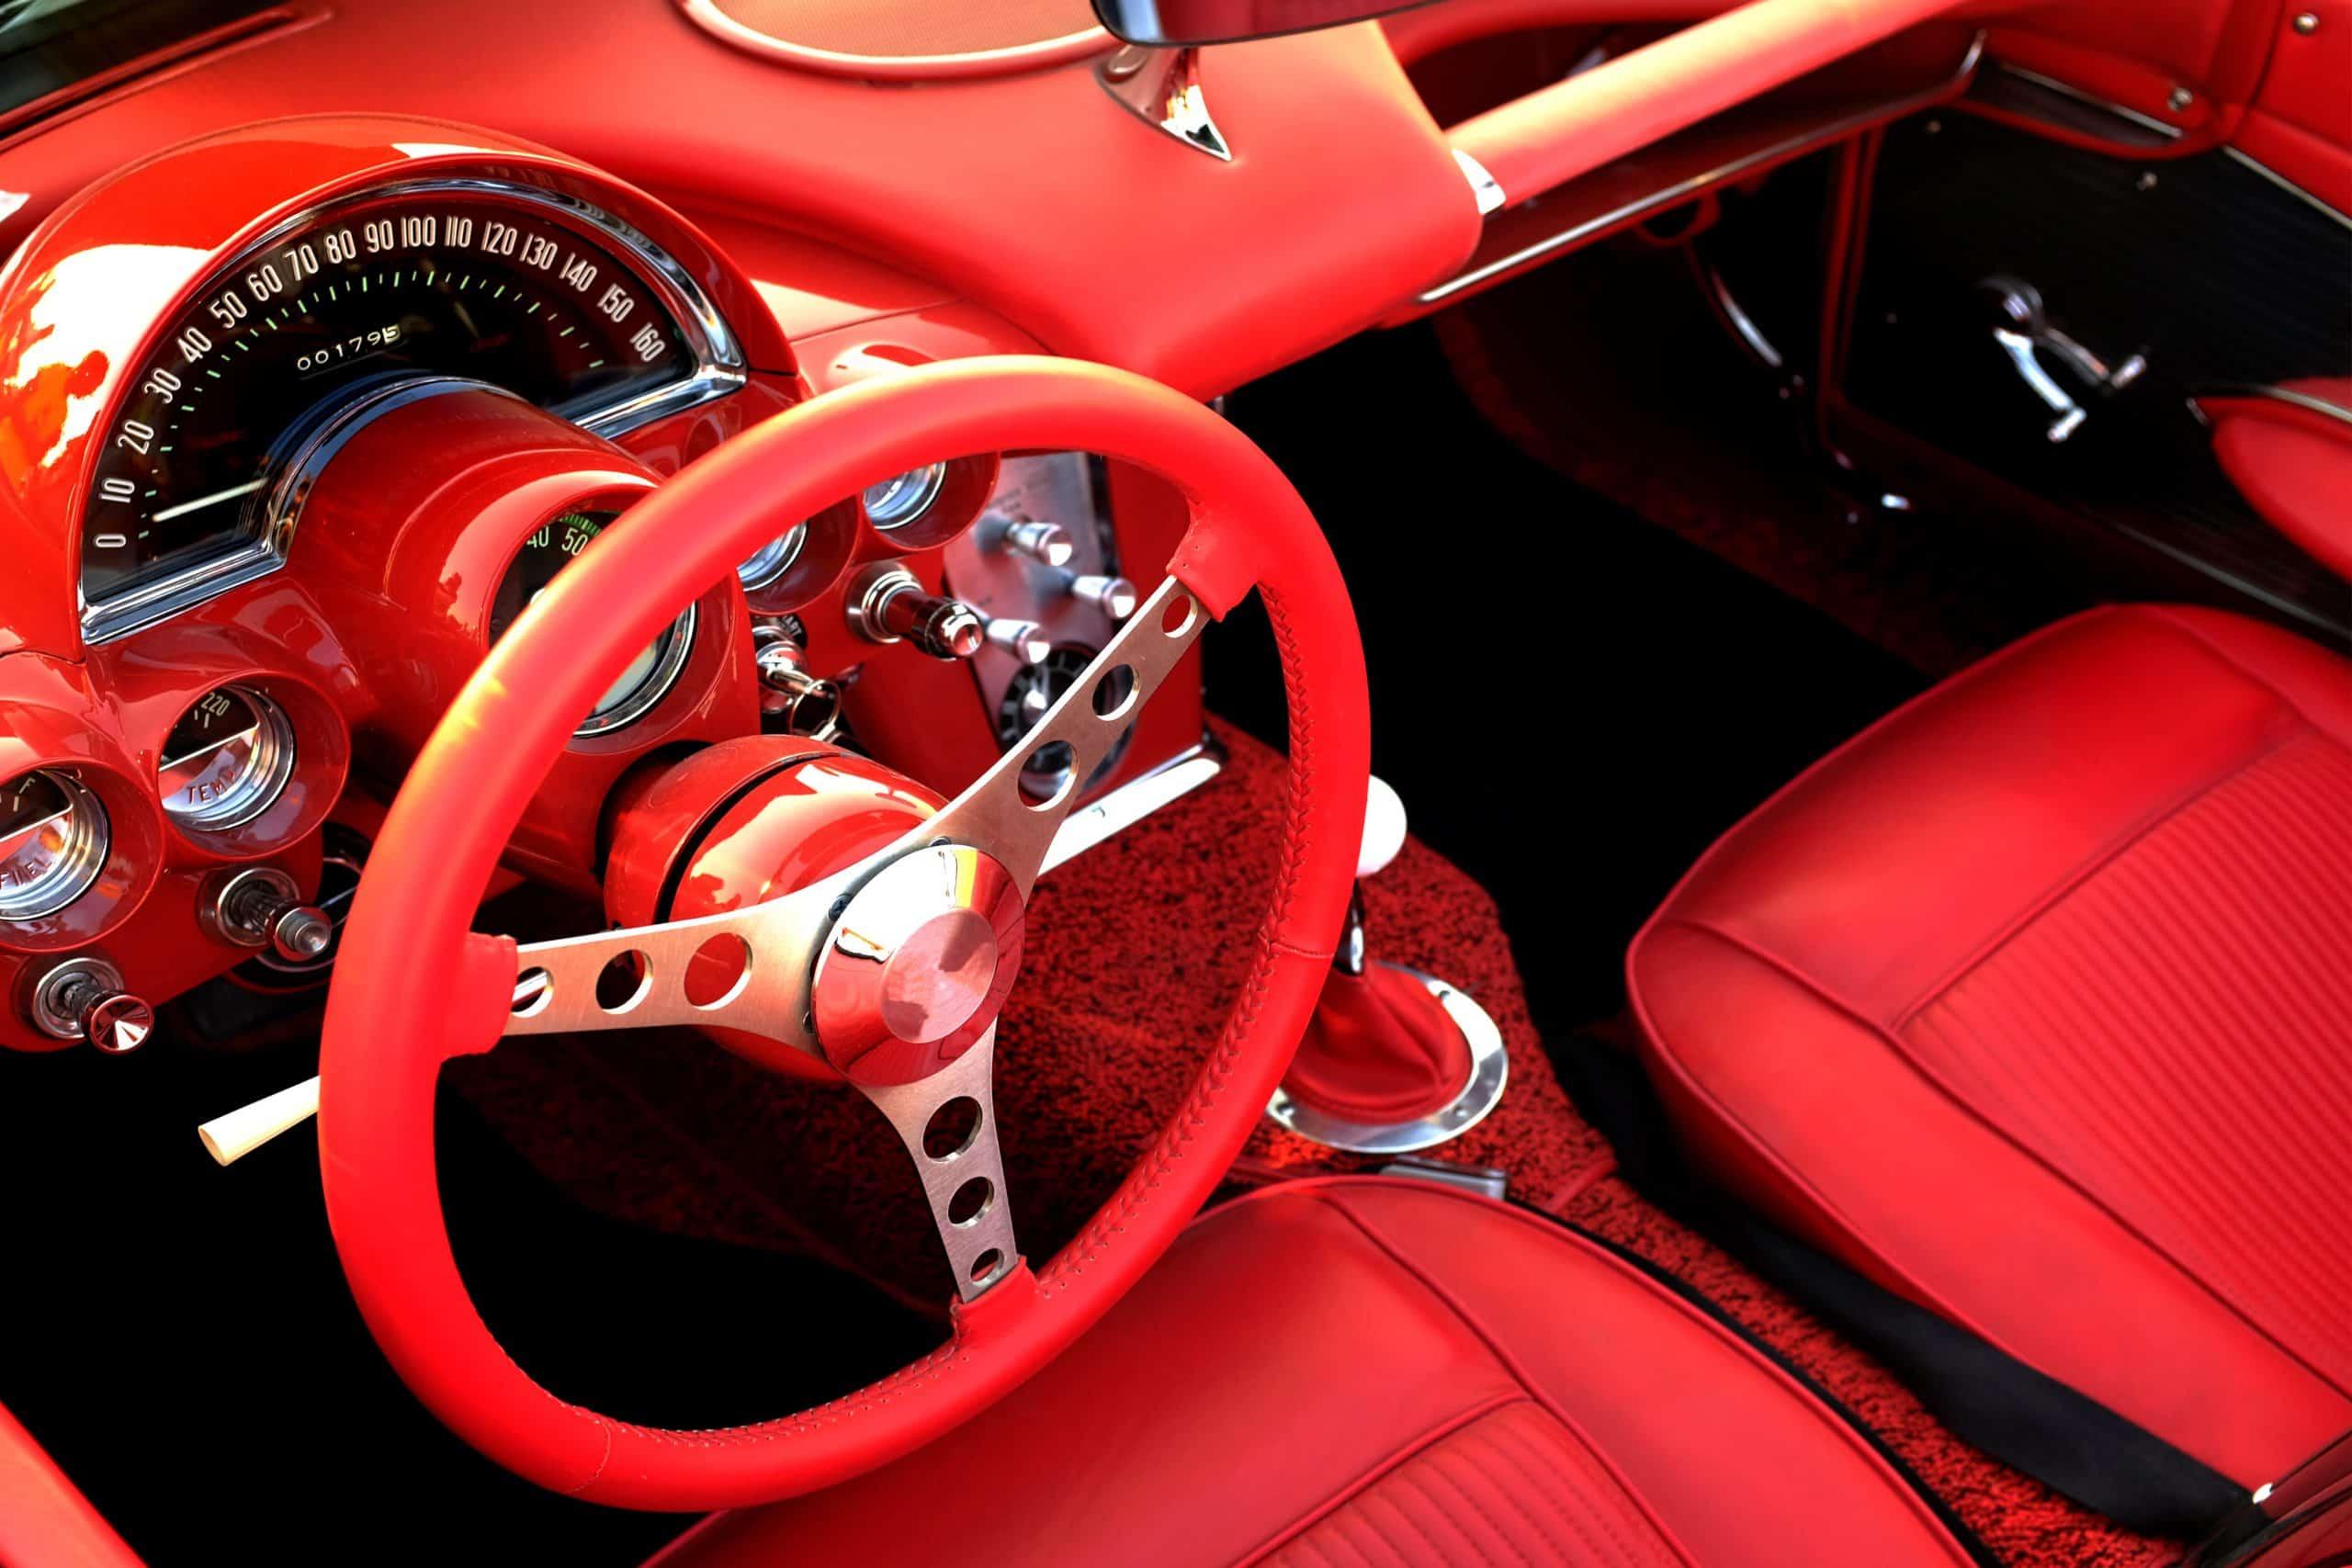 4 Key Factors to Consider When Choosing an Automotive Upholsterer